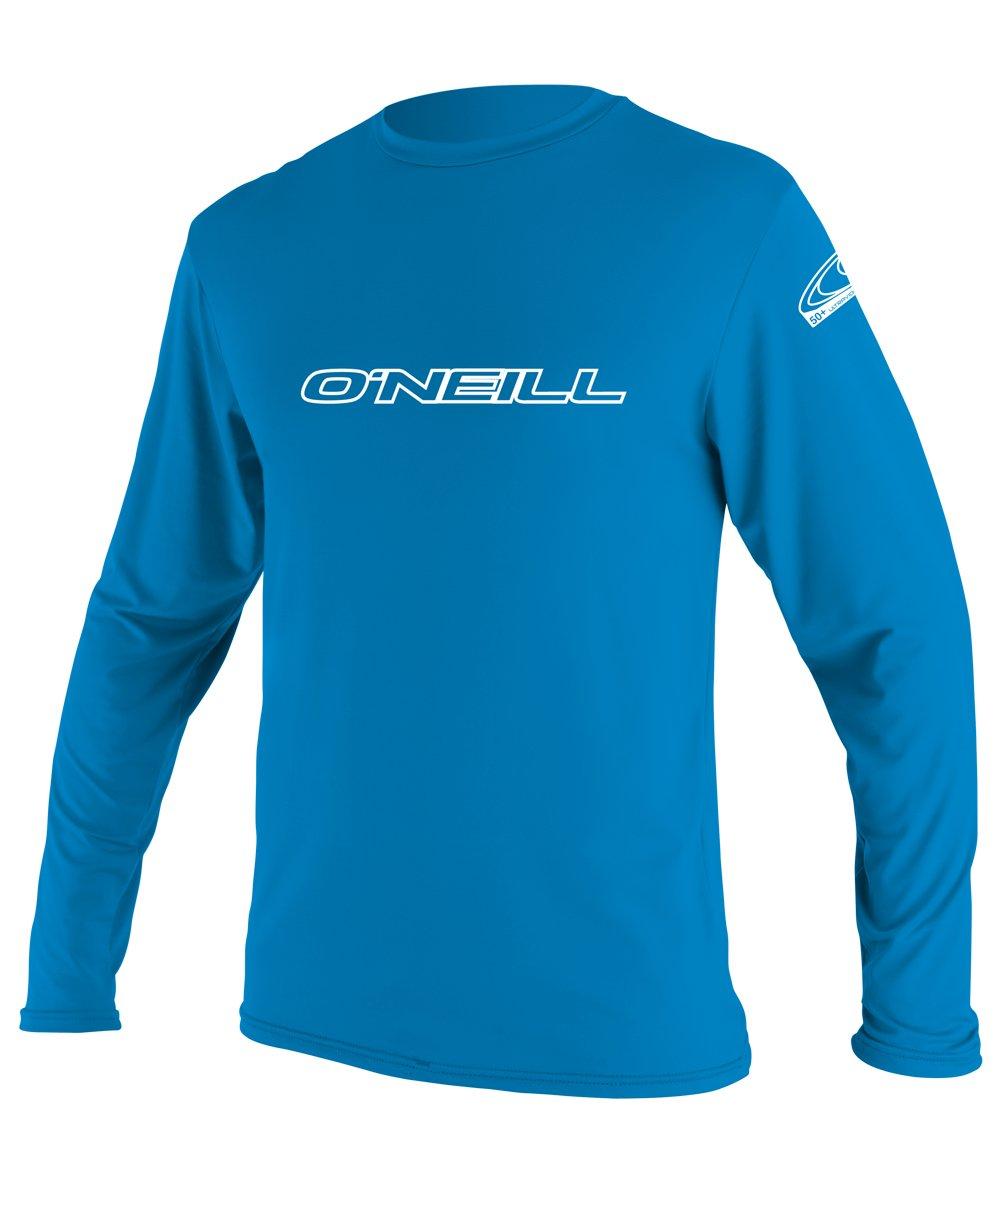 O'Neill Youth Basic Skins UPF 50 Long Sleeve Sun Shirt